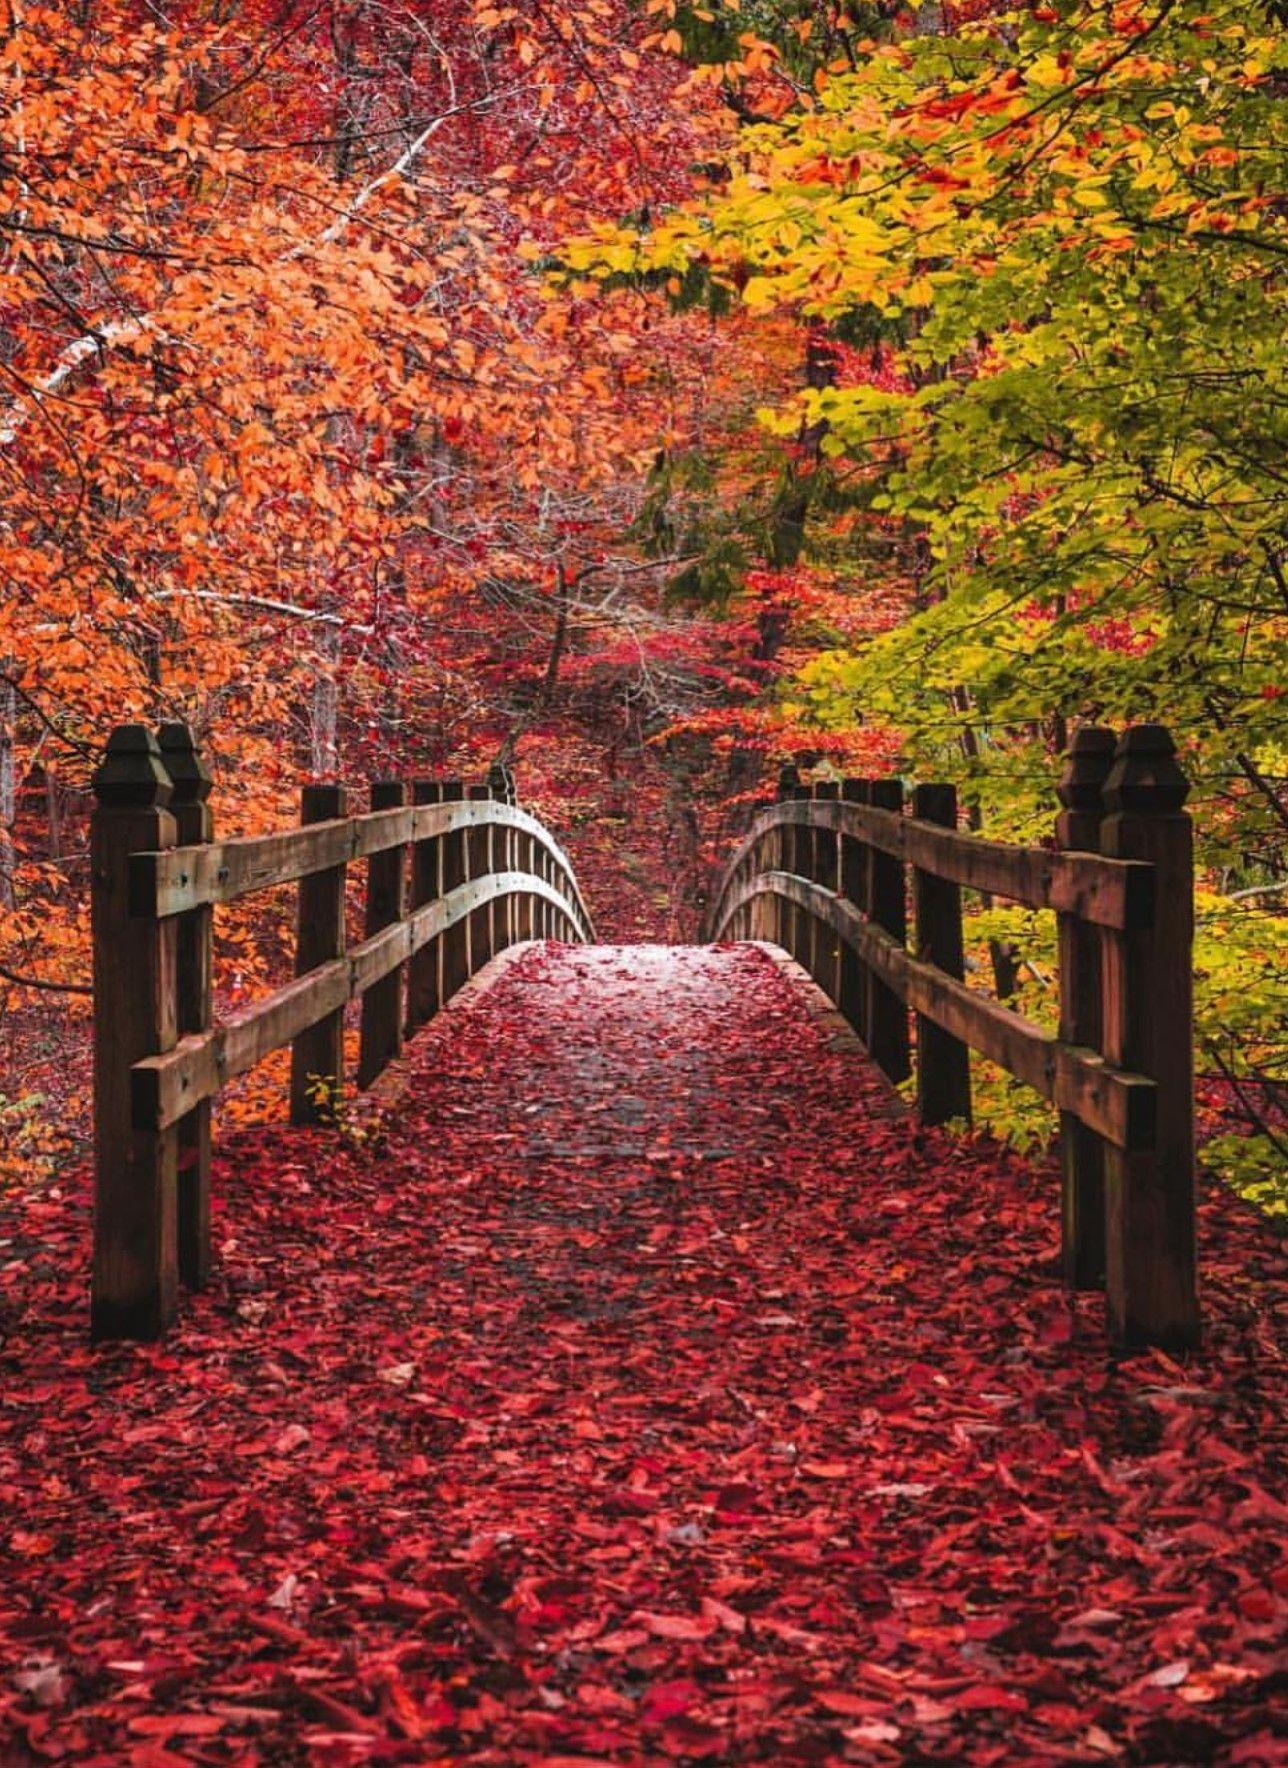 Pin By Lena Mamidaki On Autumn Colours Fall Pictures Beautiful Nature Autumn Scenes